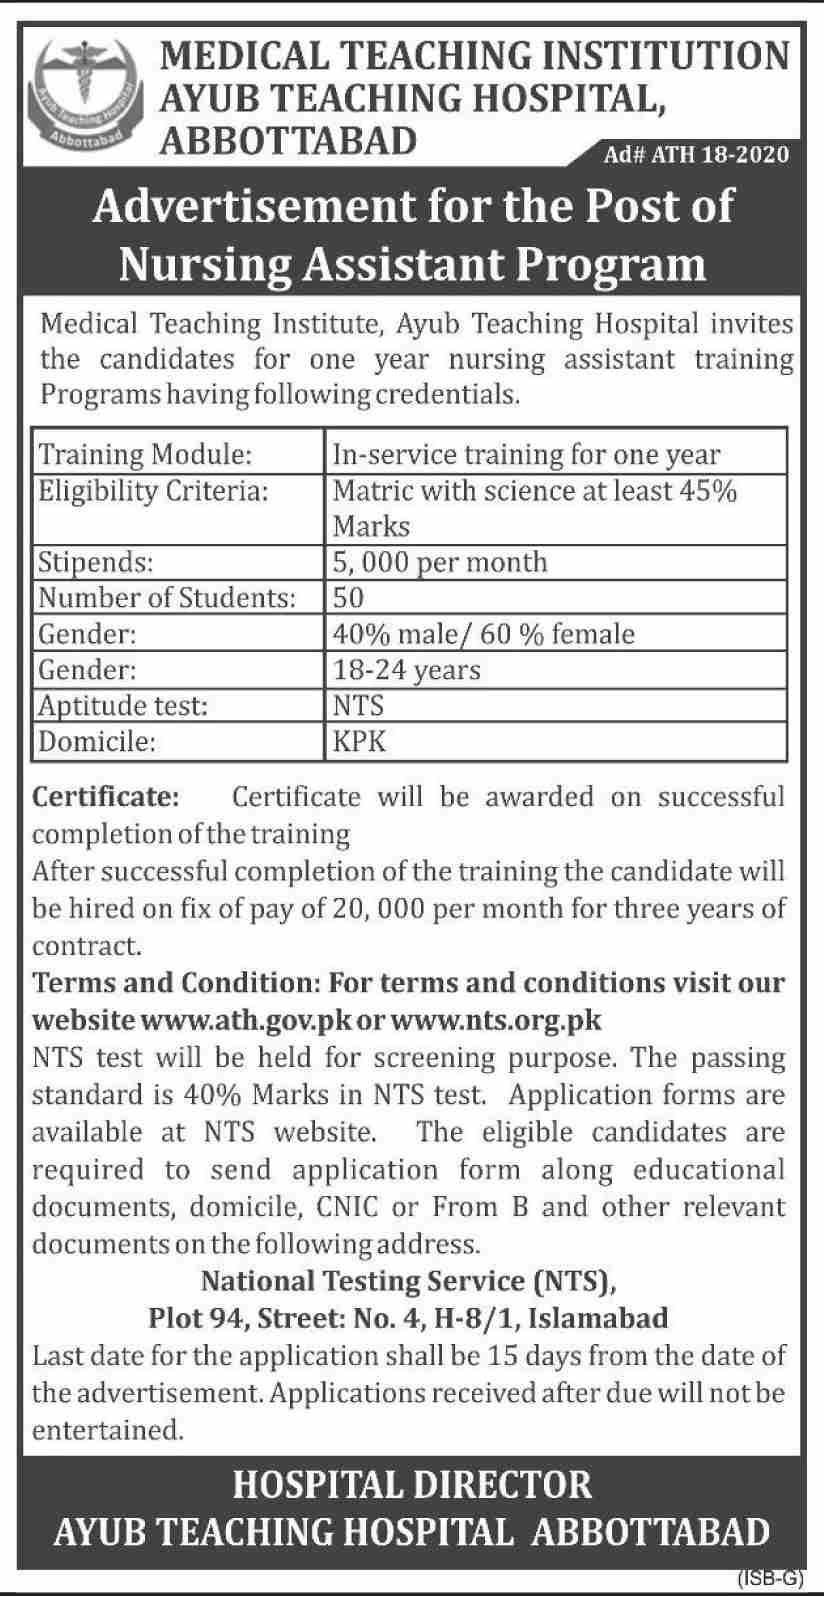 Ayub Teaching Hospital Abbottabad Nursing Assistant NTS Results